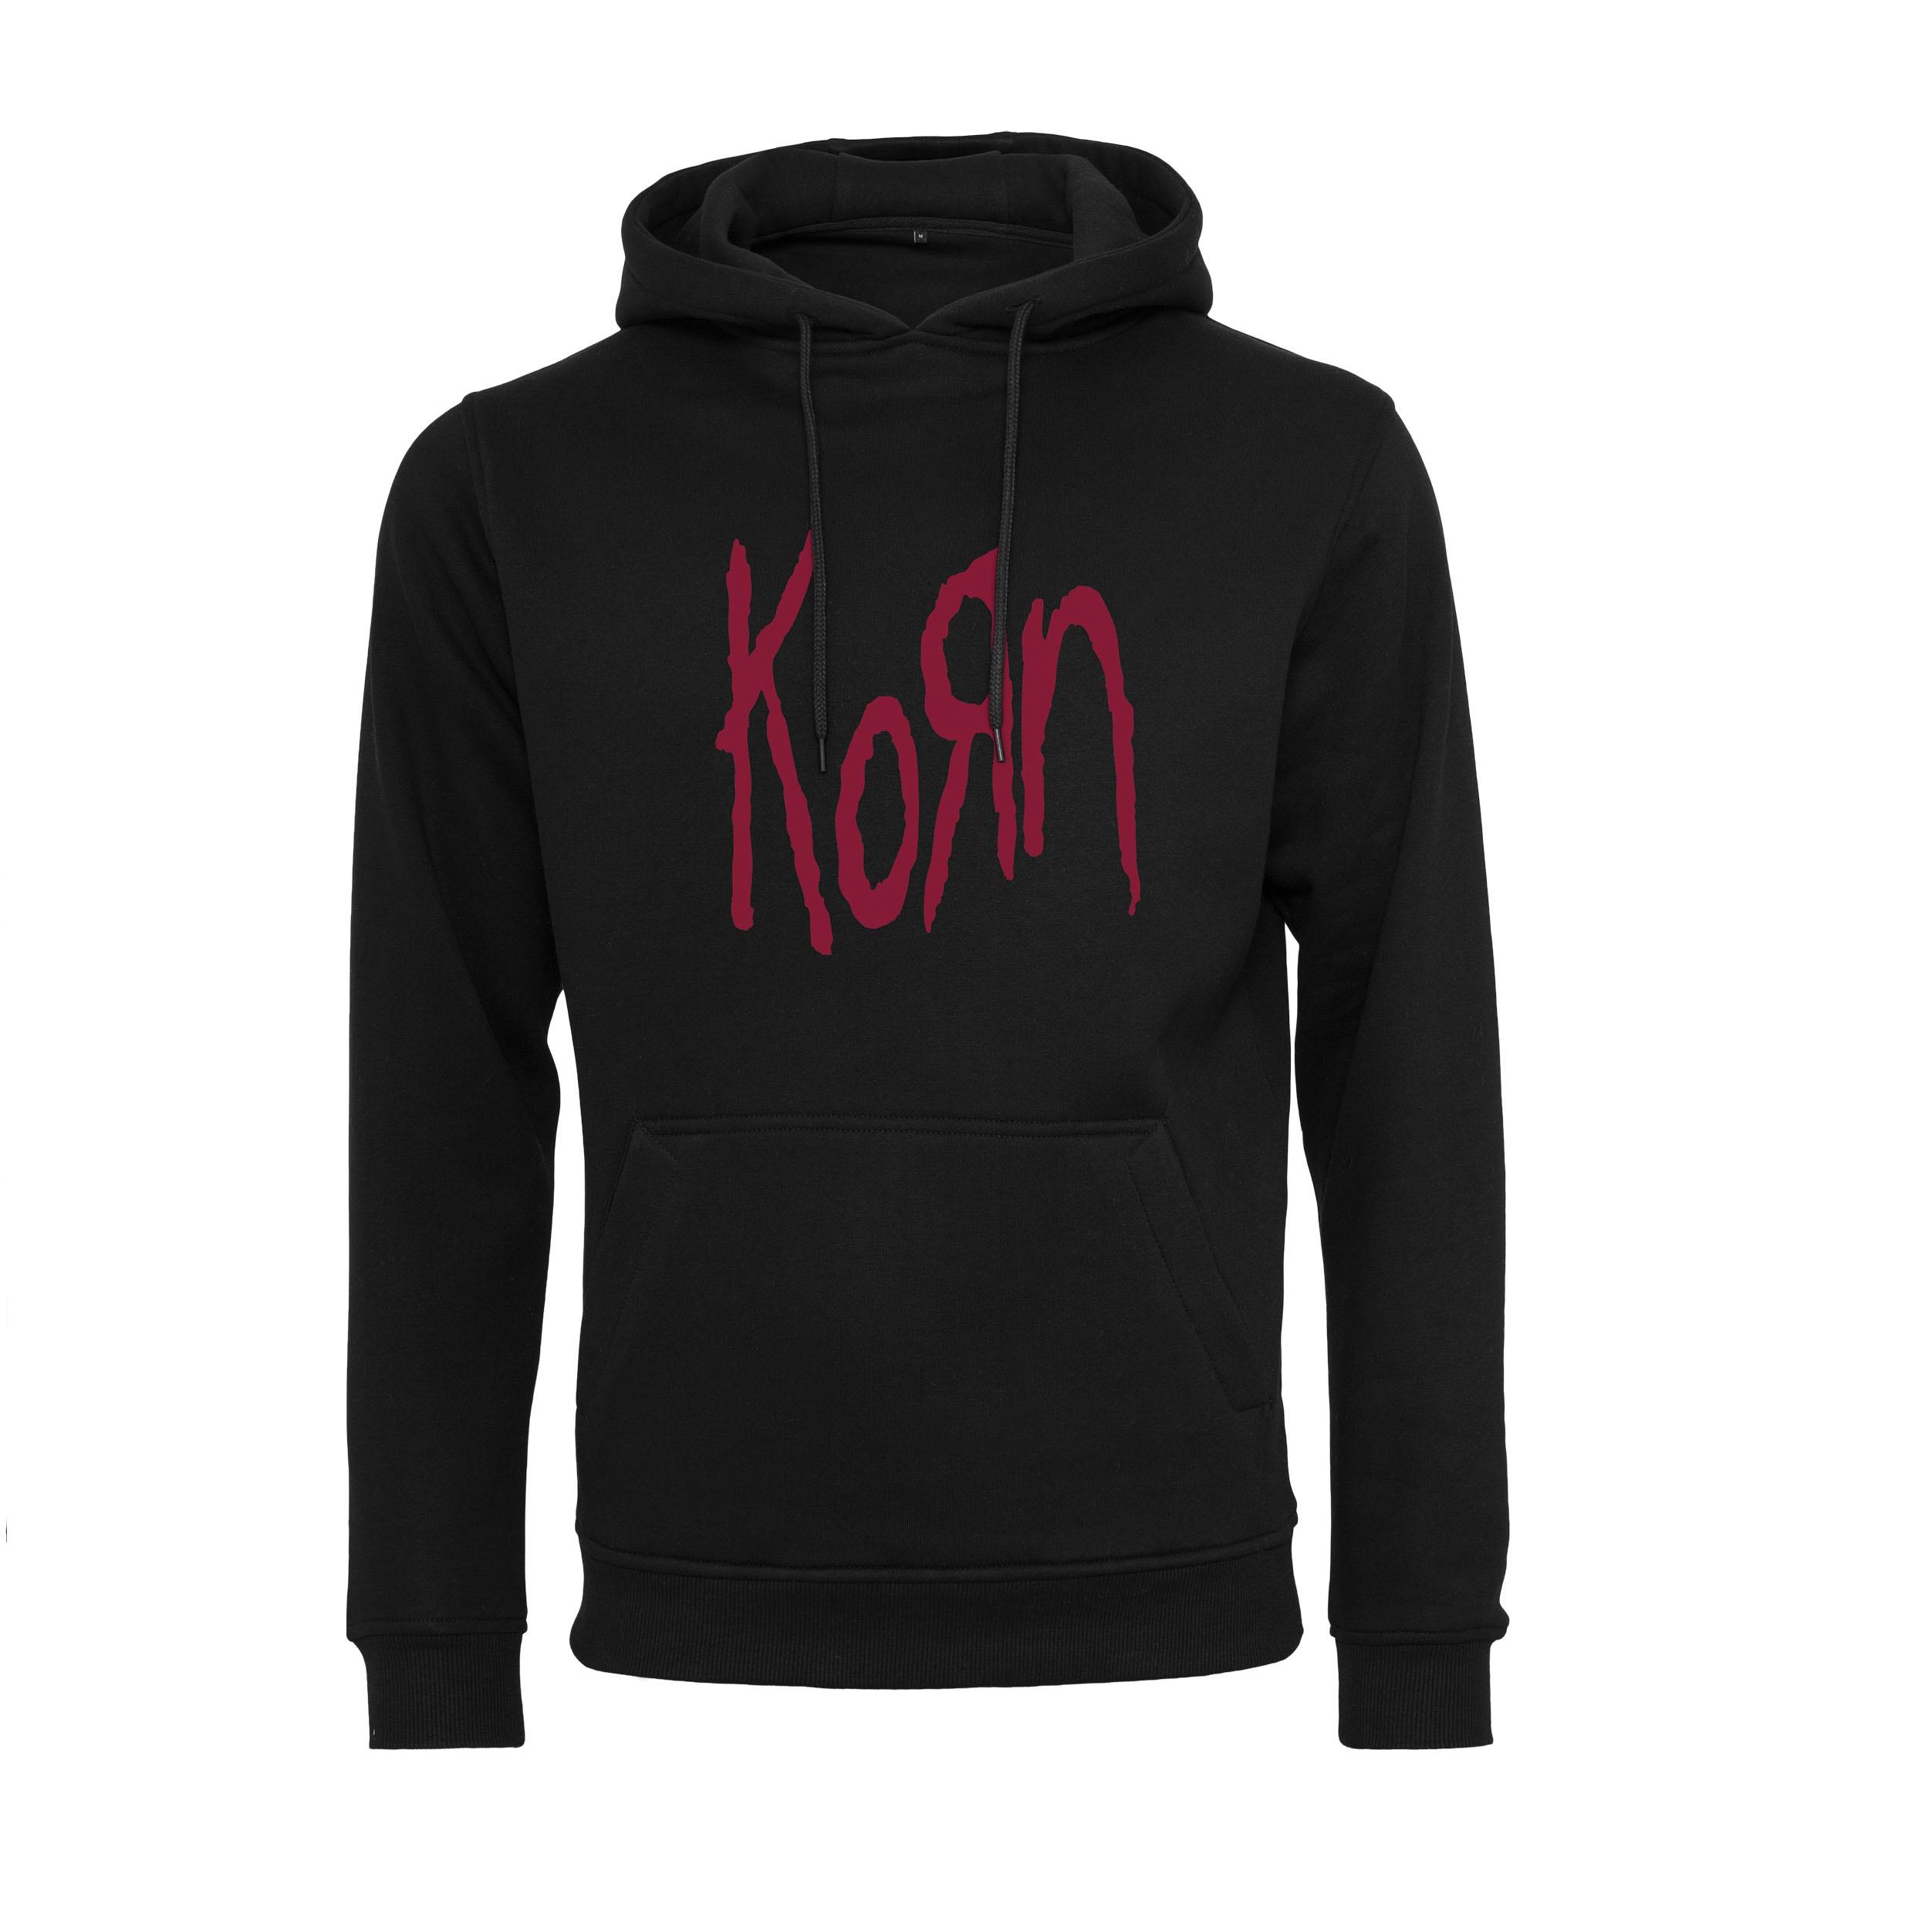 Korn - Mikina Logo Hoody - Muž, Čierna, XS